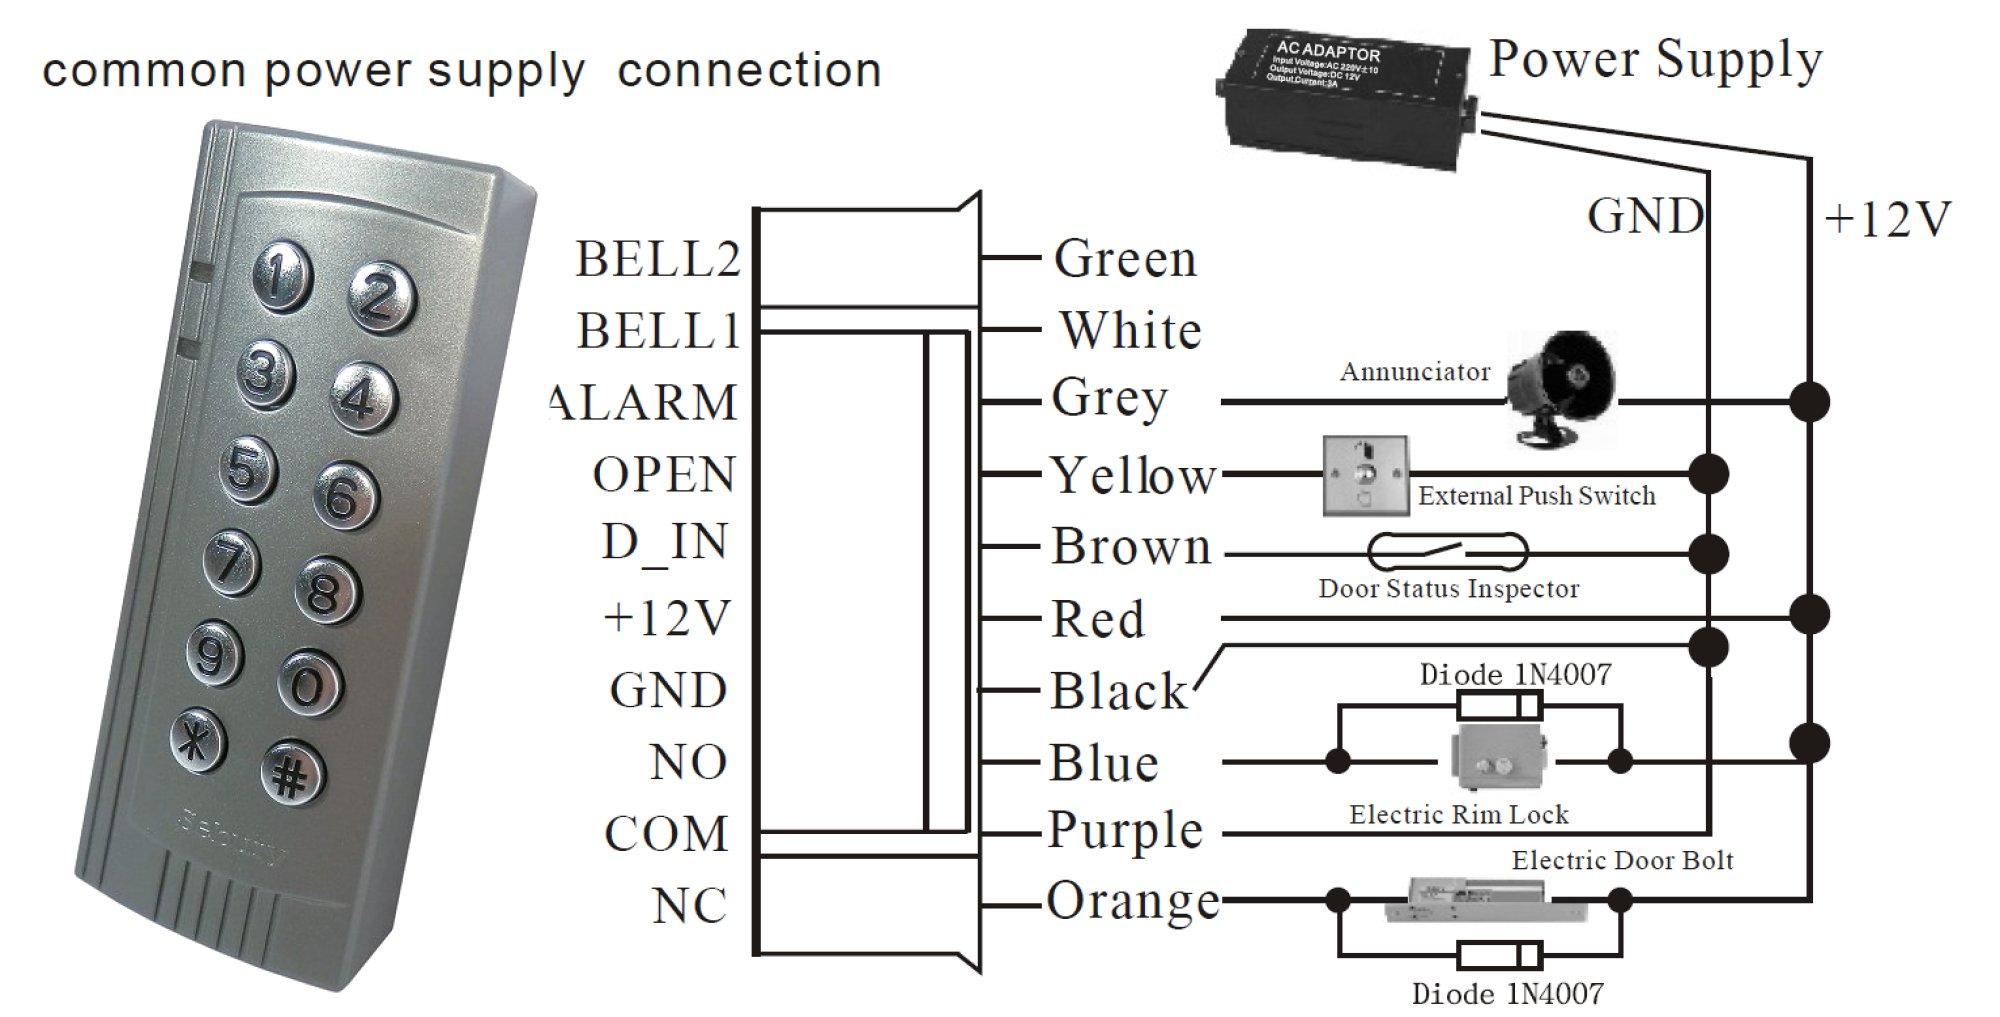 IndSeburyK4_Wiring_v?resize\\d665%2C338 access control wiring diagram efcaviation com electric rim lock wiring diagram at bakdesigns.co